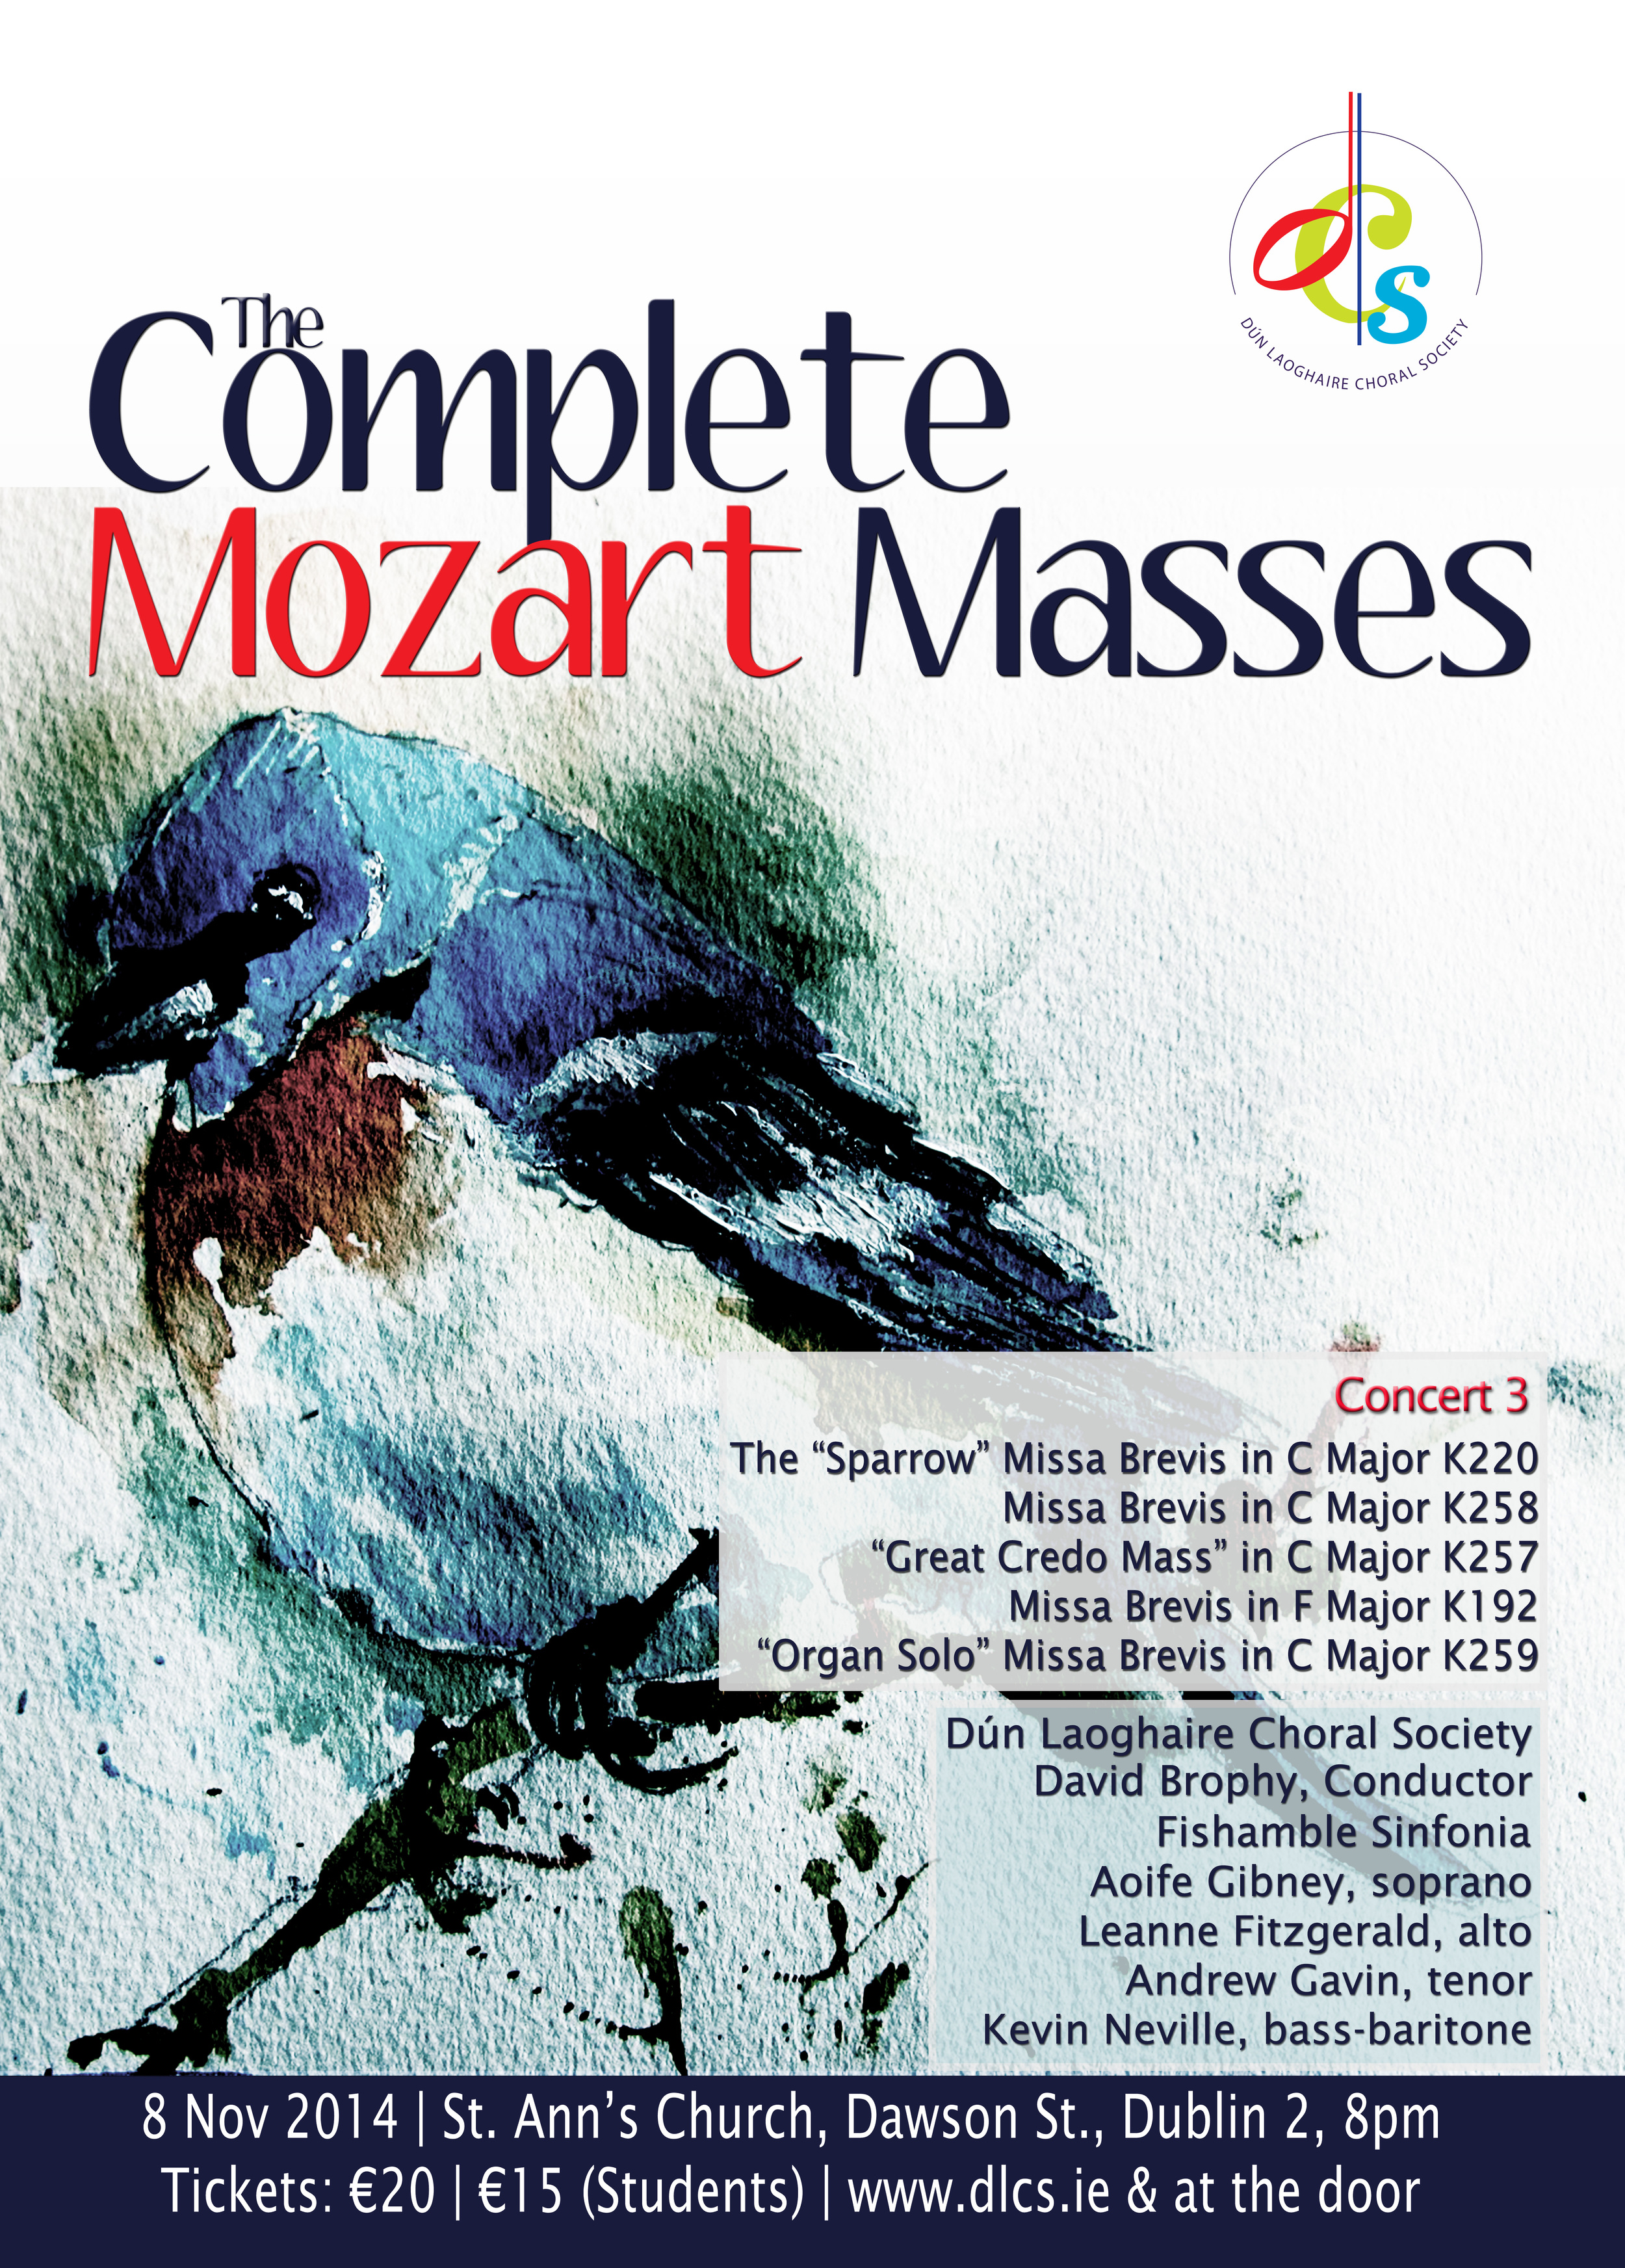 Complete Mozart Masses Concert 3, 8th November 2014